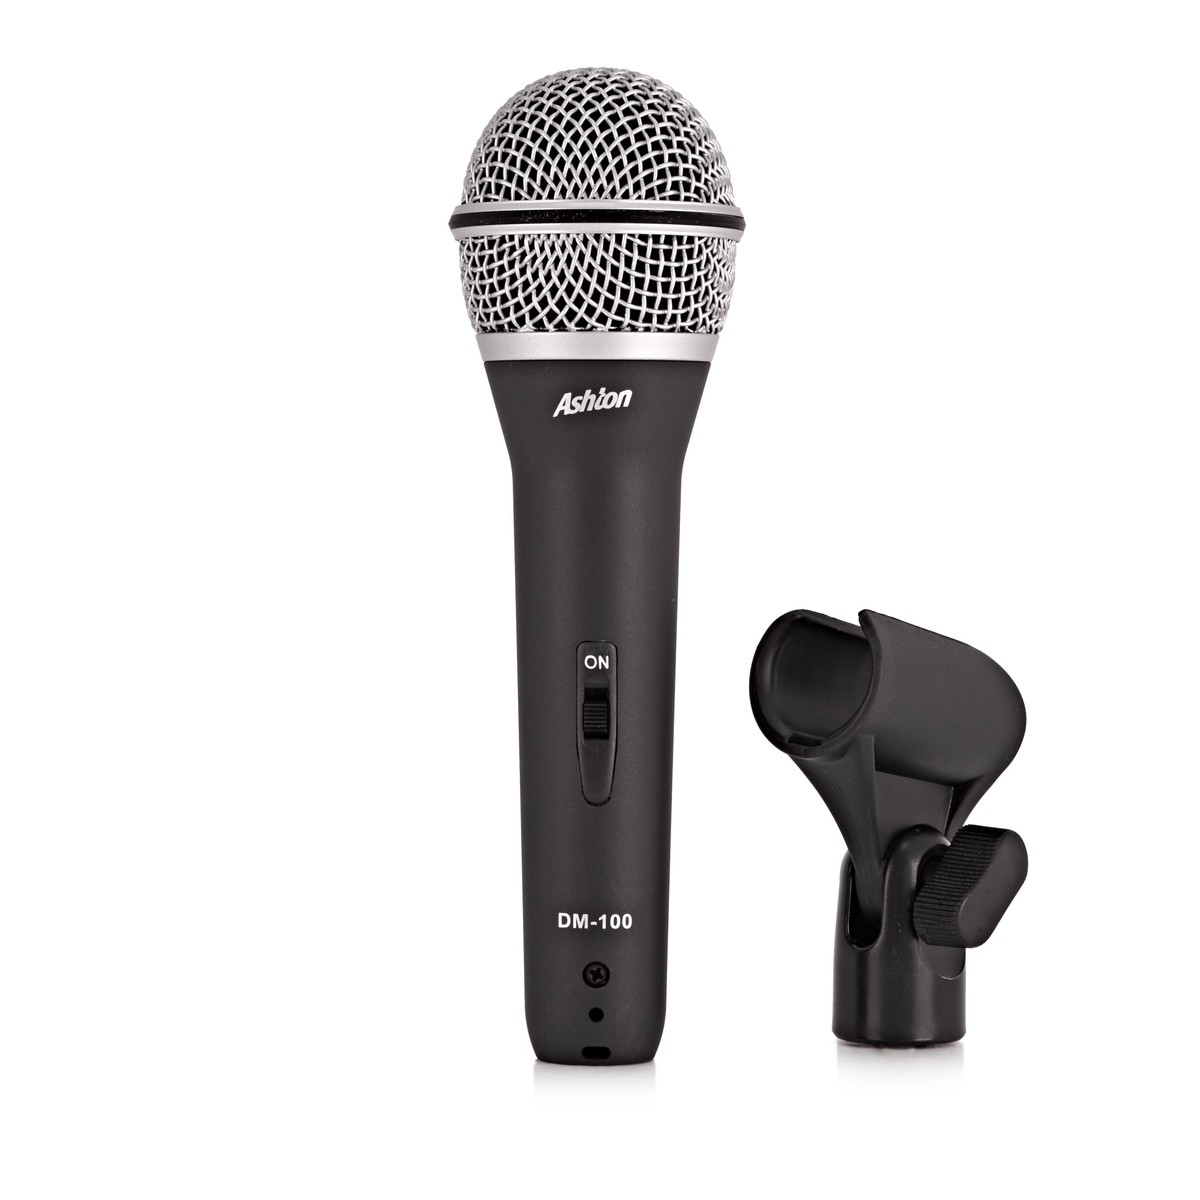 Astounding Disc Ashton Dm100J Dynamic Microphone Xlr Jack Black At Gear4Music Wiring Database Gramgelartorg